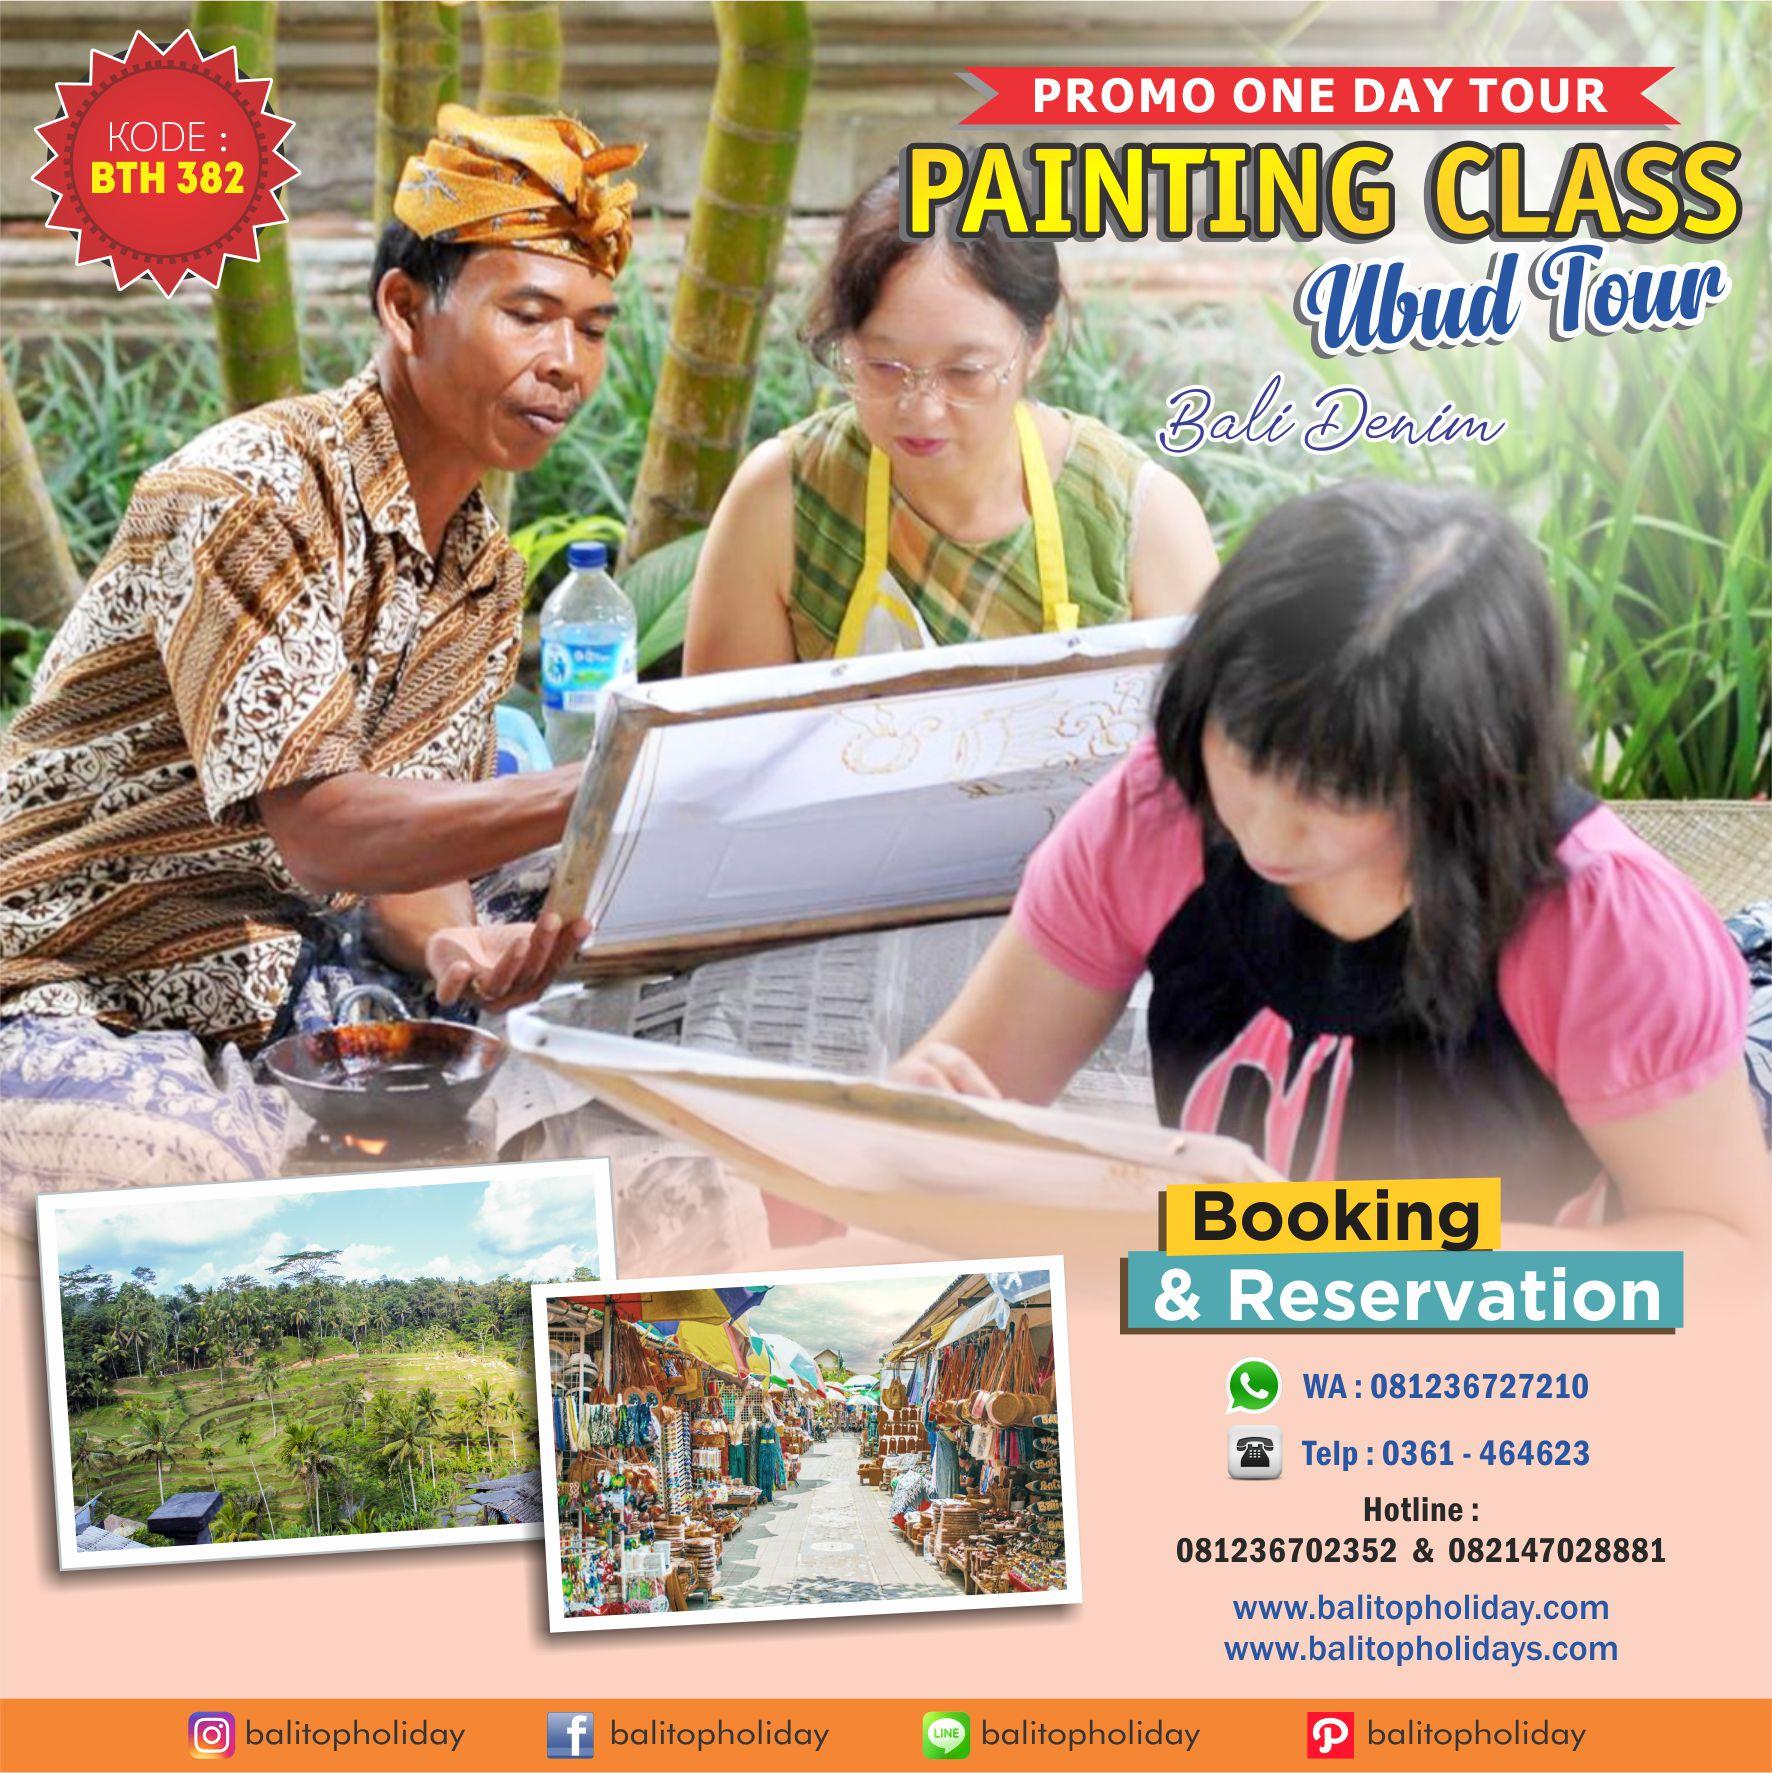 Tour ubud & painting class